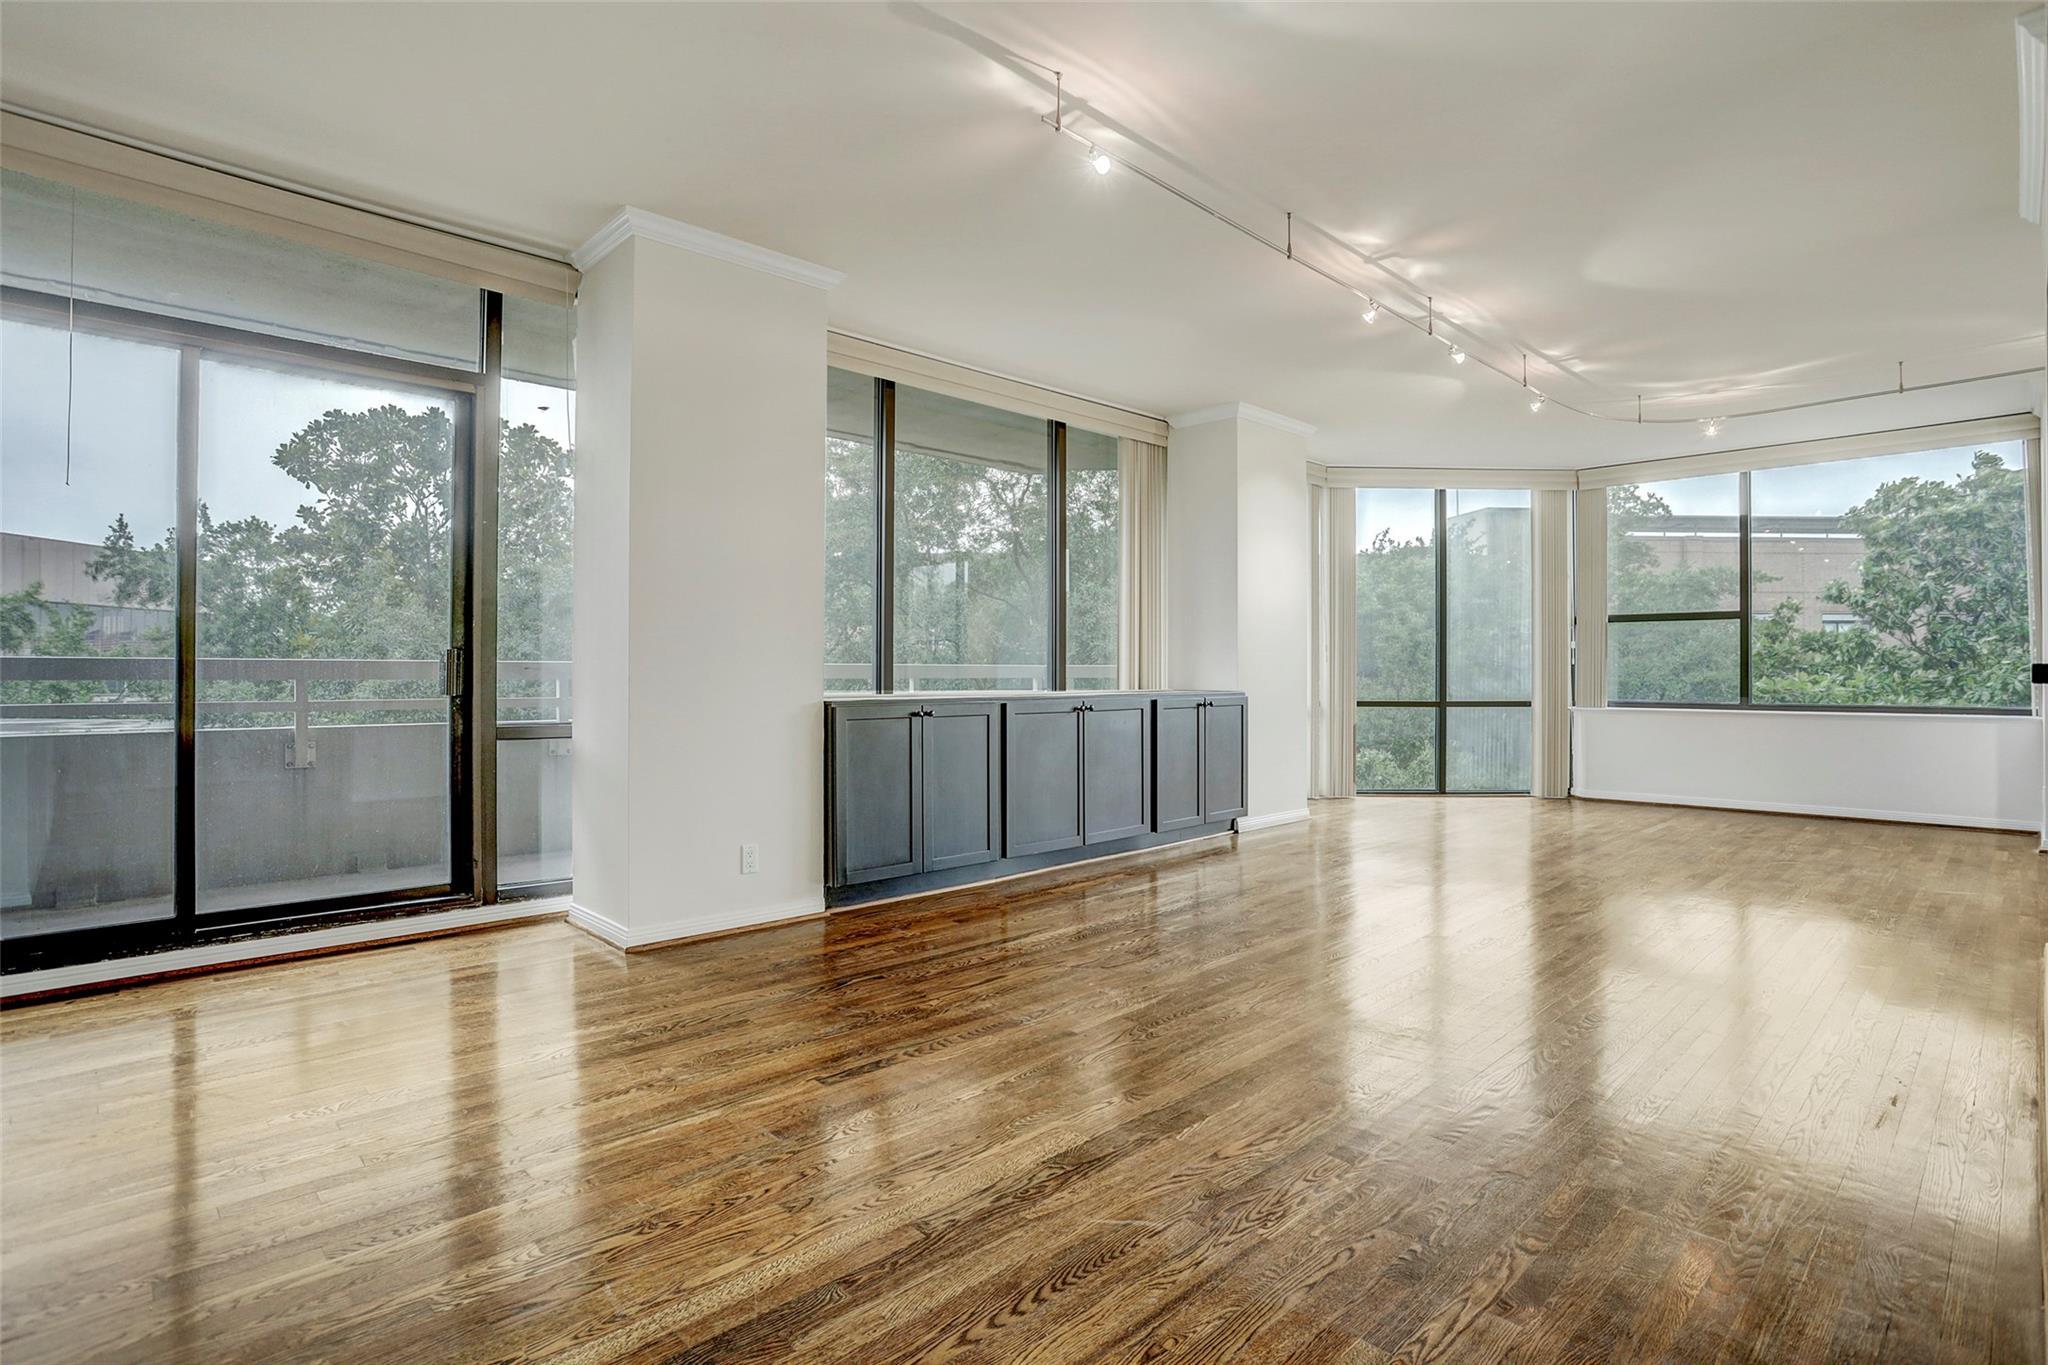 15 Greenway Plaza #4G Property Photo - Houston, TX real estate listing